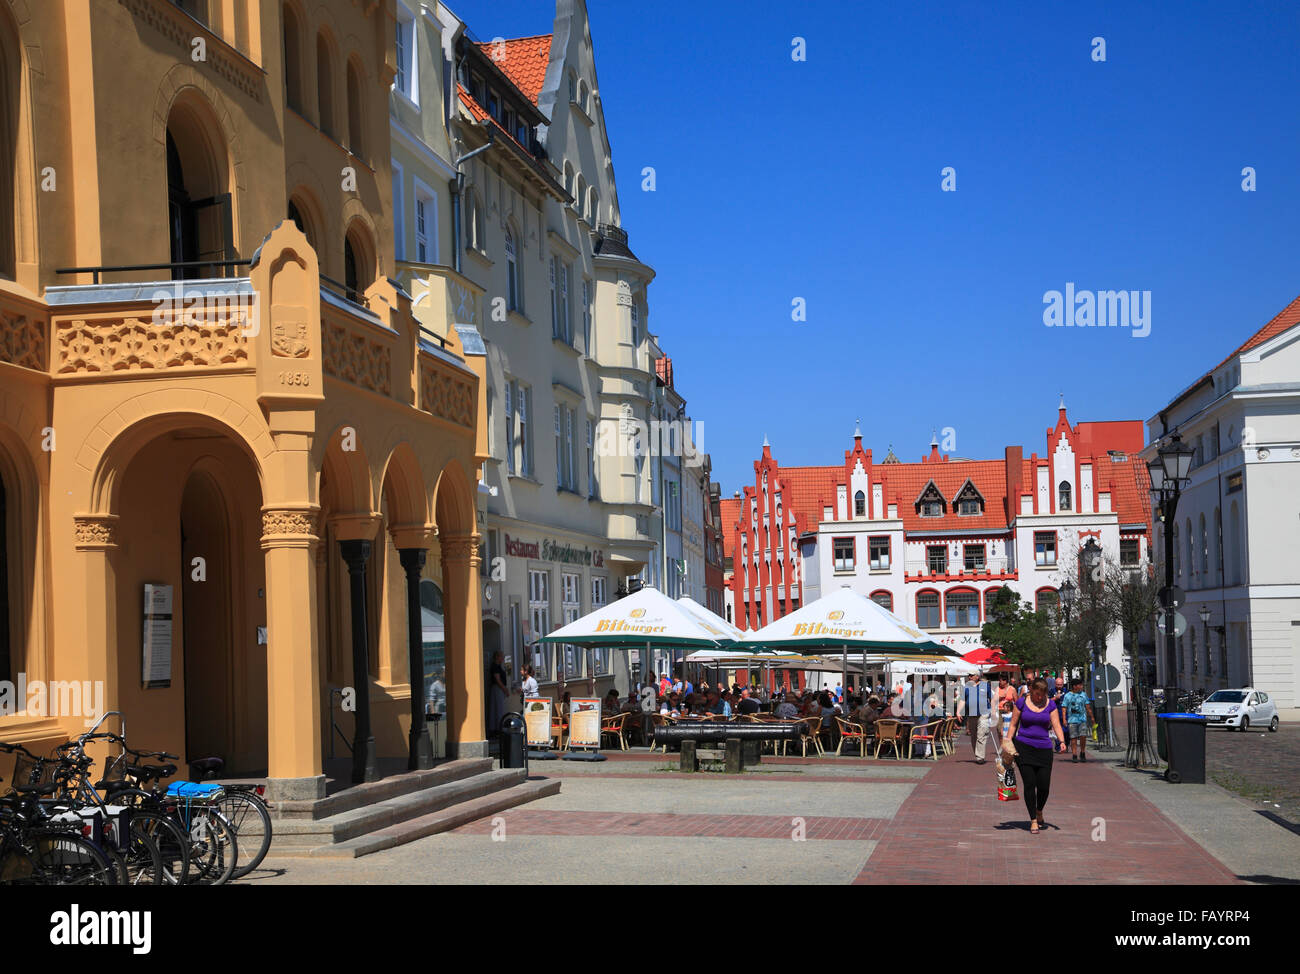 Cafes at market square, Wismar, Baltic Sea, Mecklenburg Western Pomerania, Germany, Europe - Stock Image